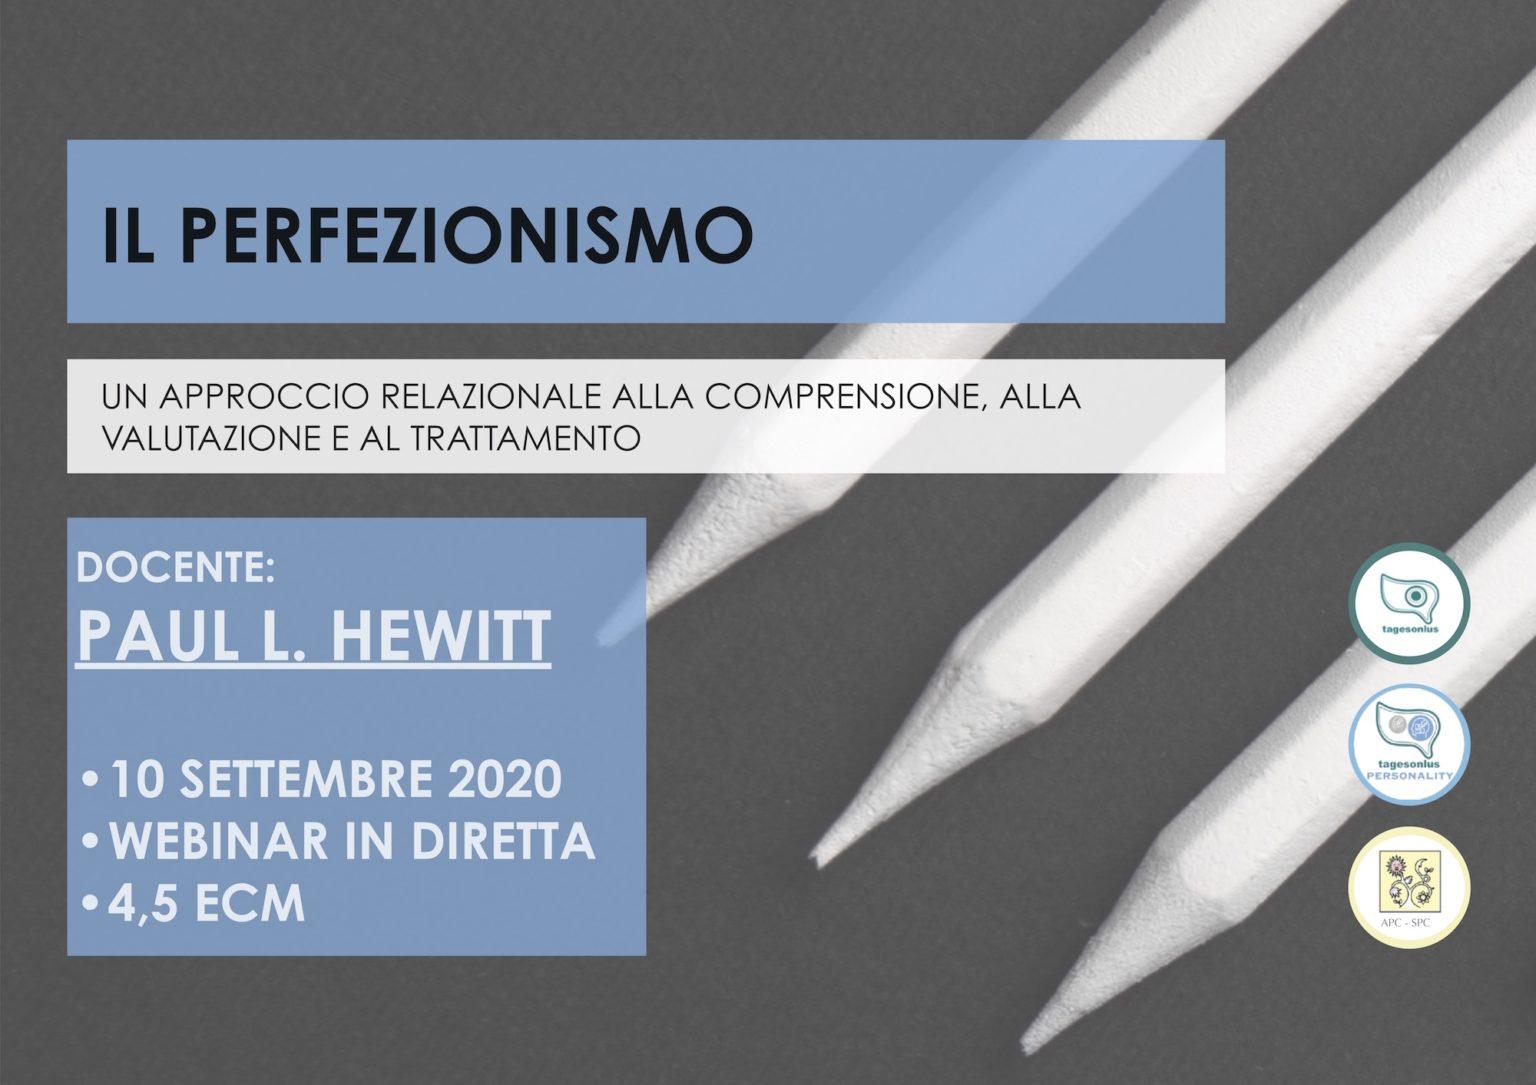 hewitt, perfezionismo, webinar, psicoterapia